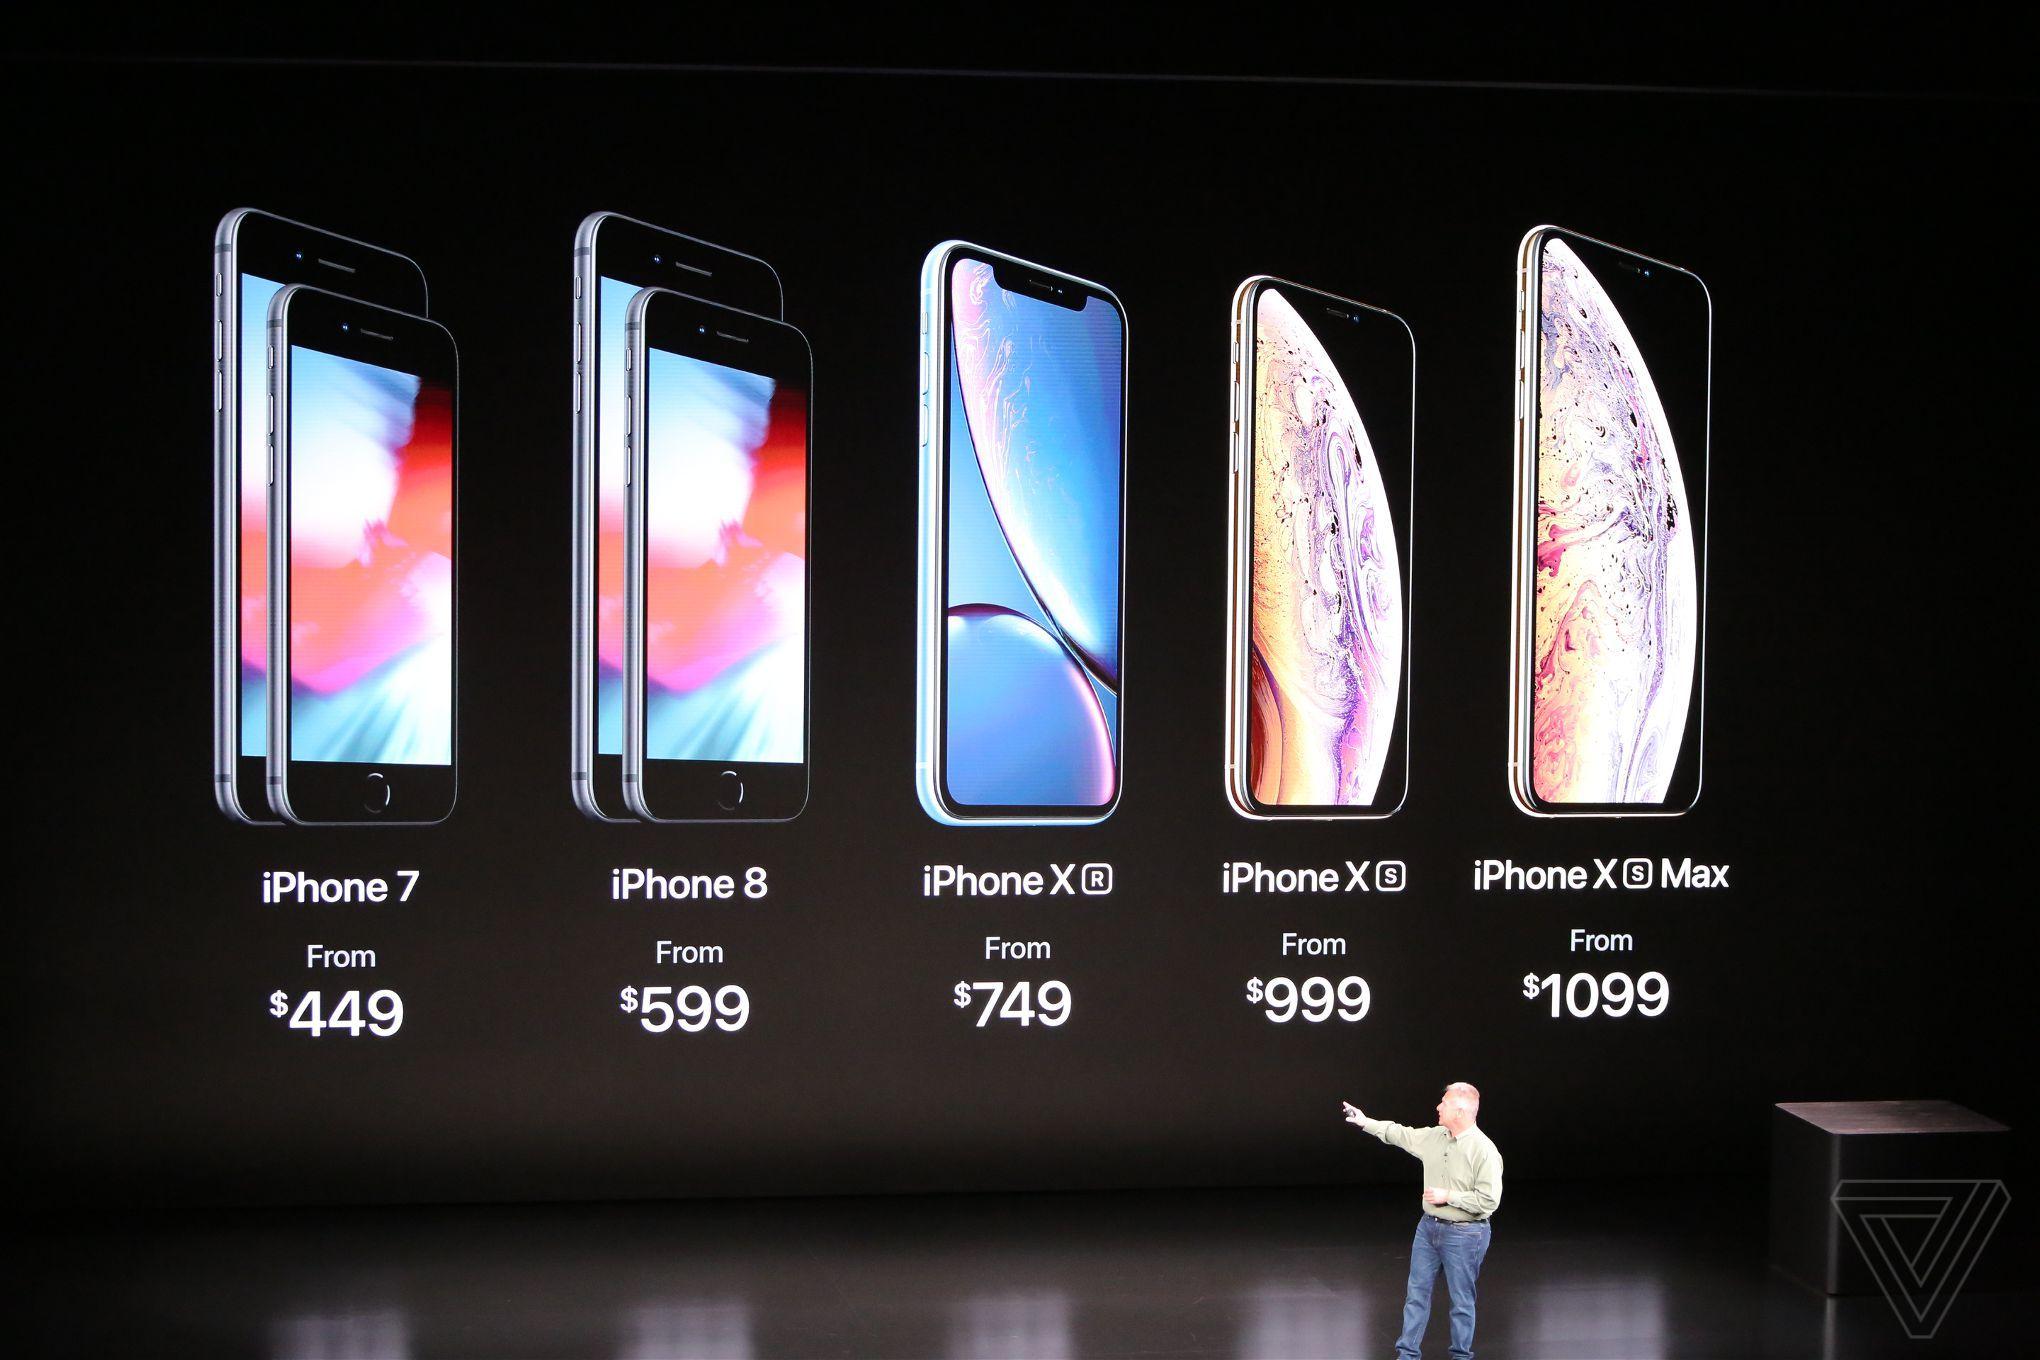 apple-iphone-2018-event-theverge-dbohn_1643[1].jpg